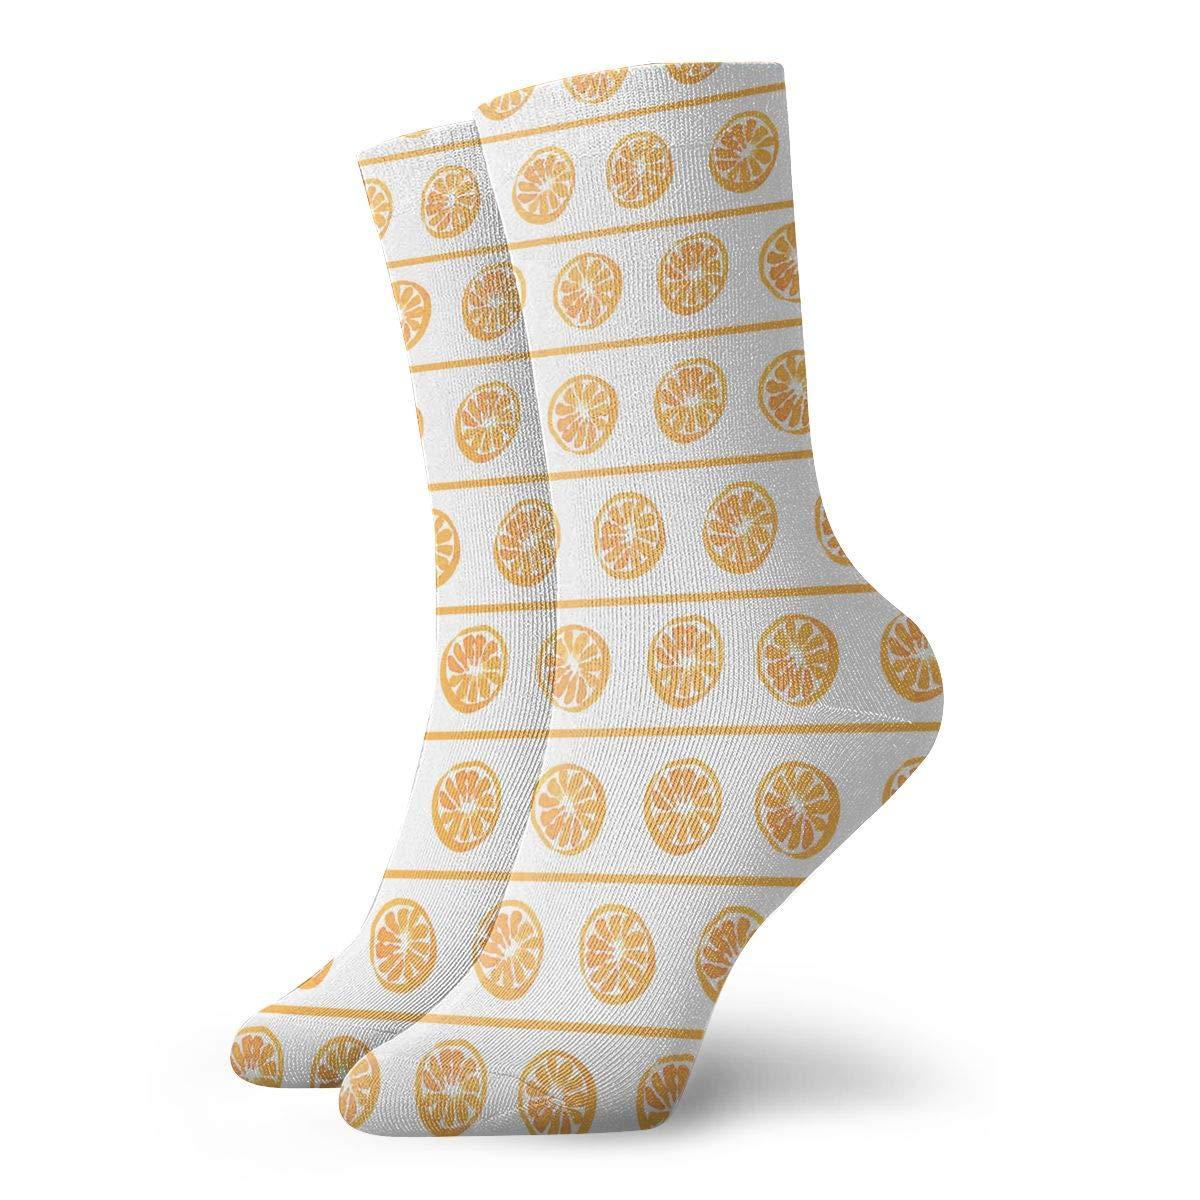 Sweet Cute Orange Unisex Funny Casual Crew Socks Athletic Socks For Boys Girls Kids Teenagers